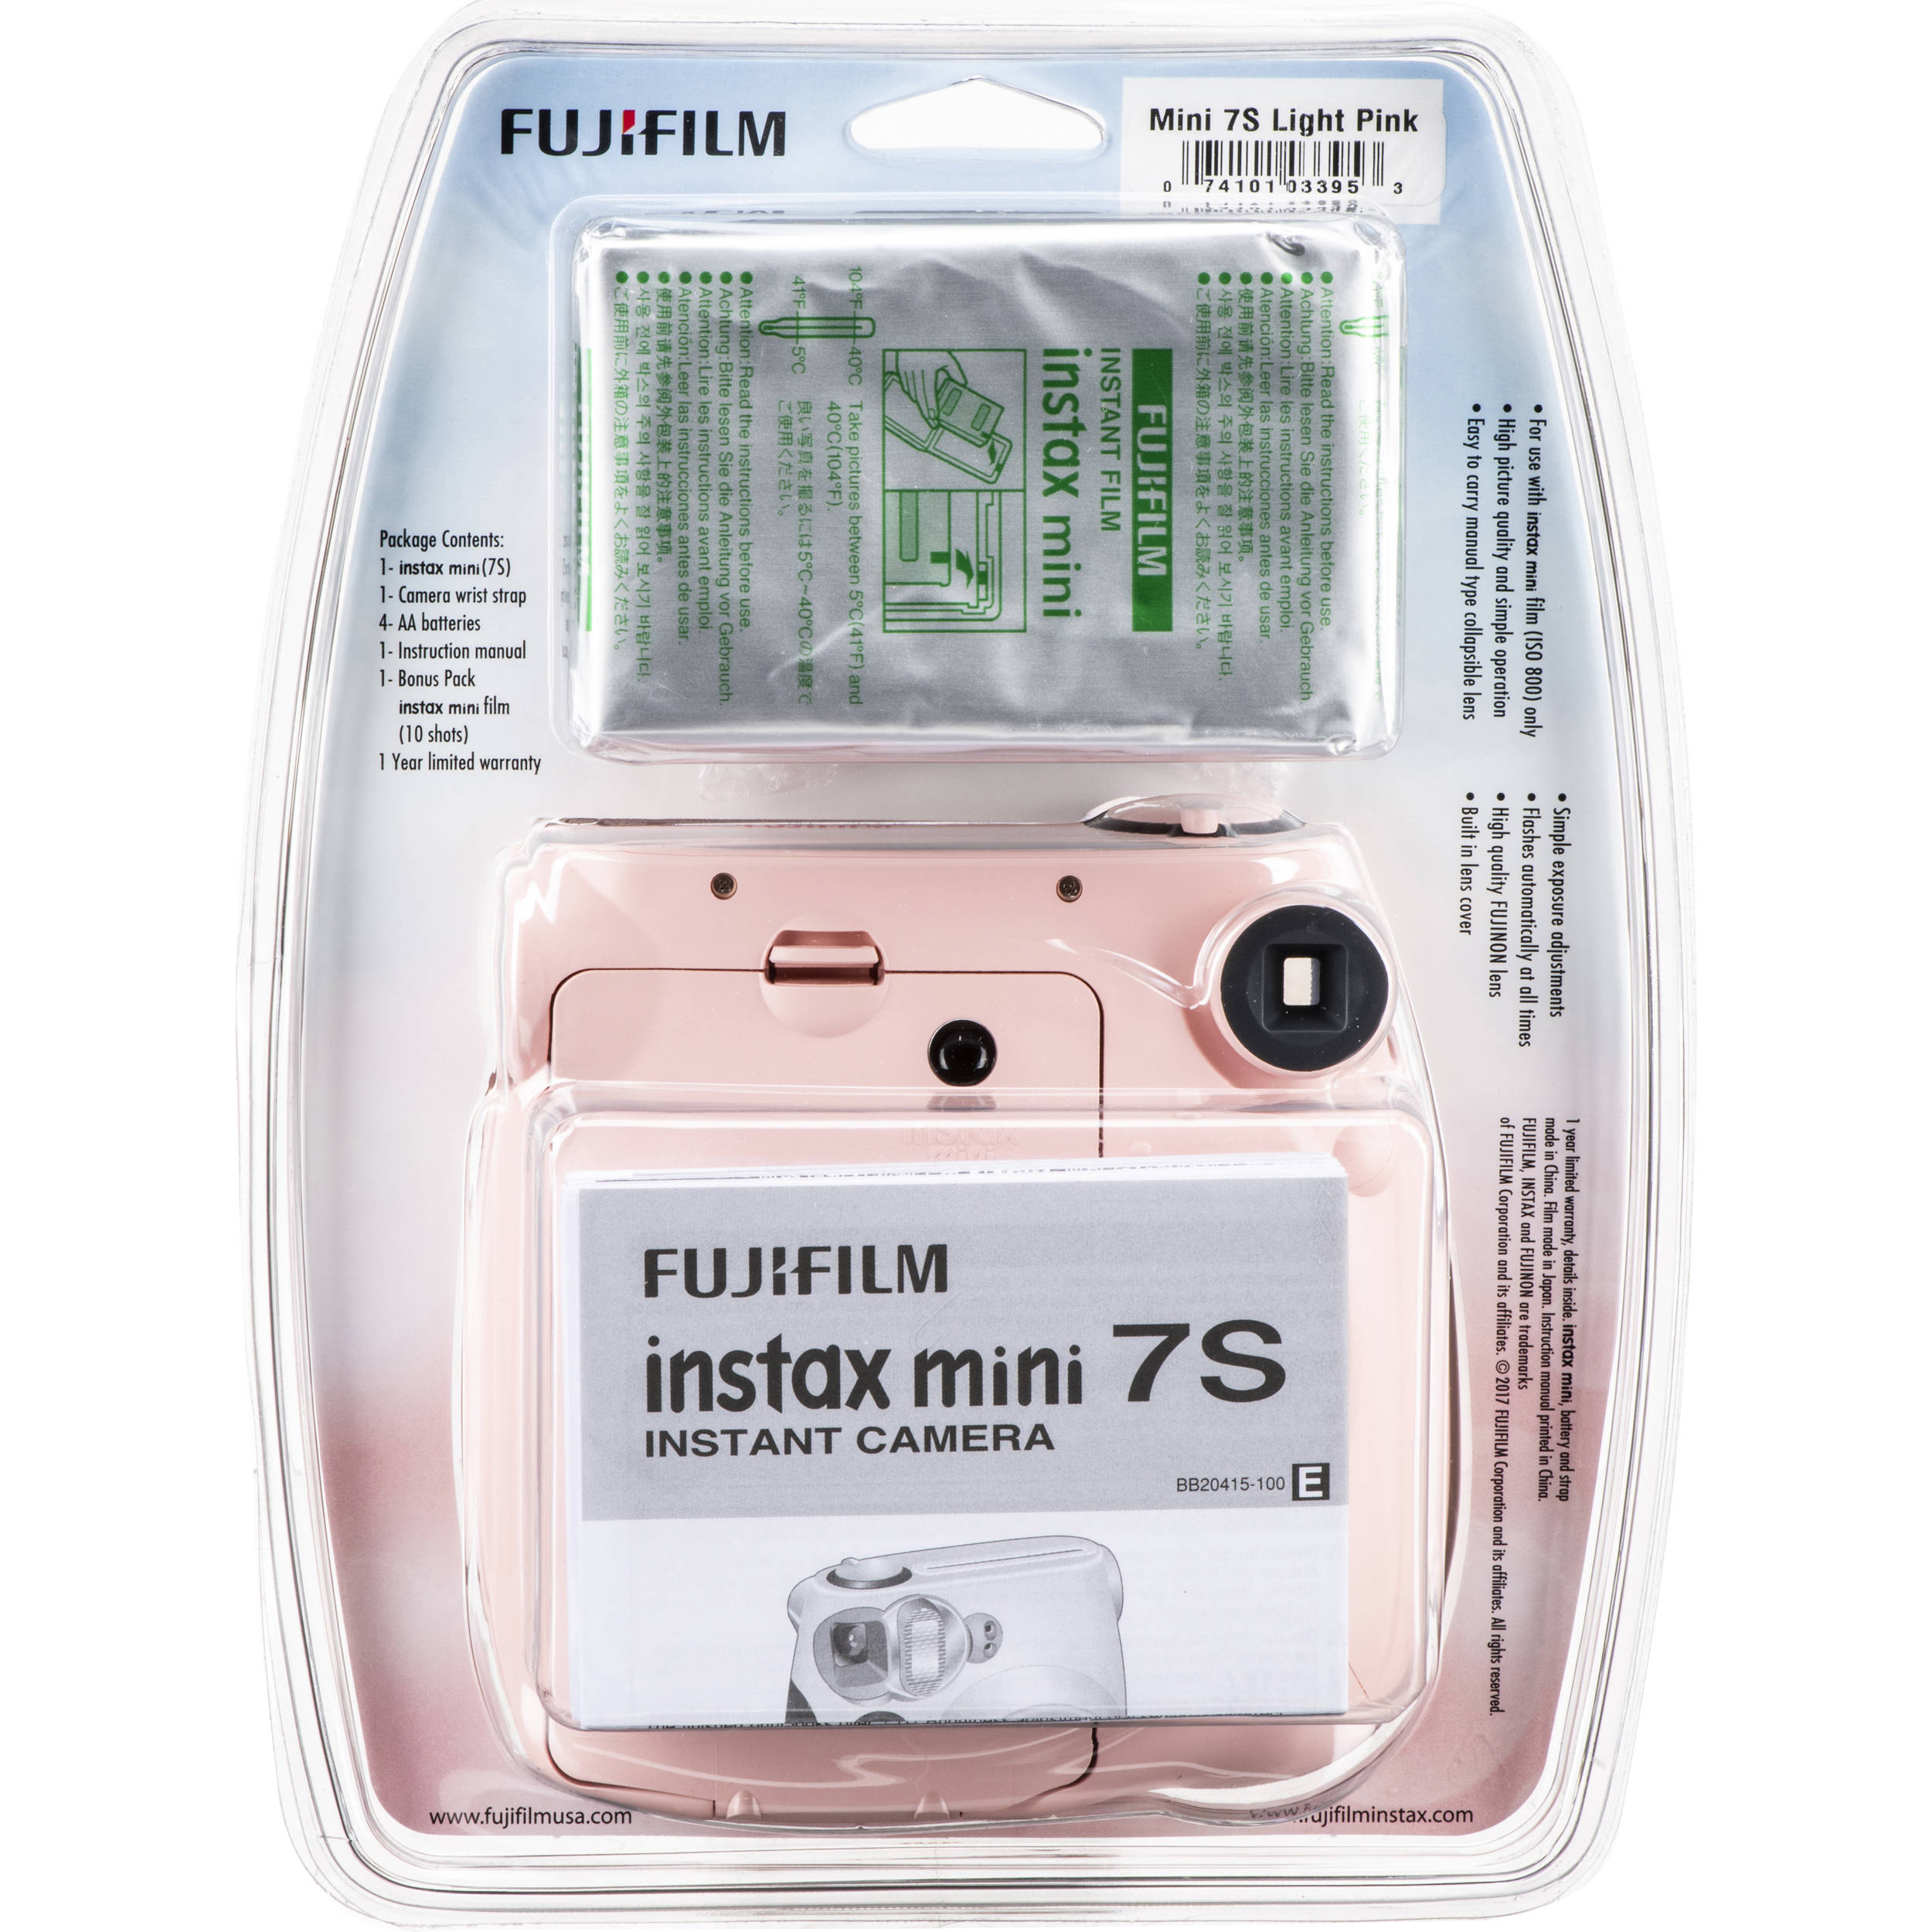 FUJIFILM INSTAX Mini 7S Instant Film Camera with Film (Light Pink)